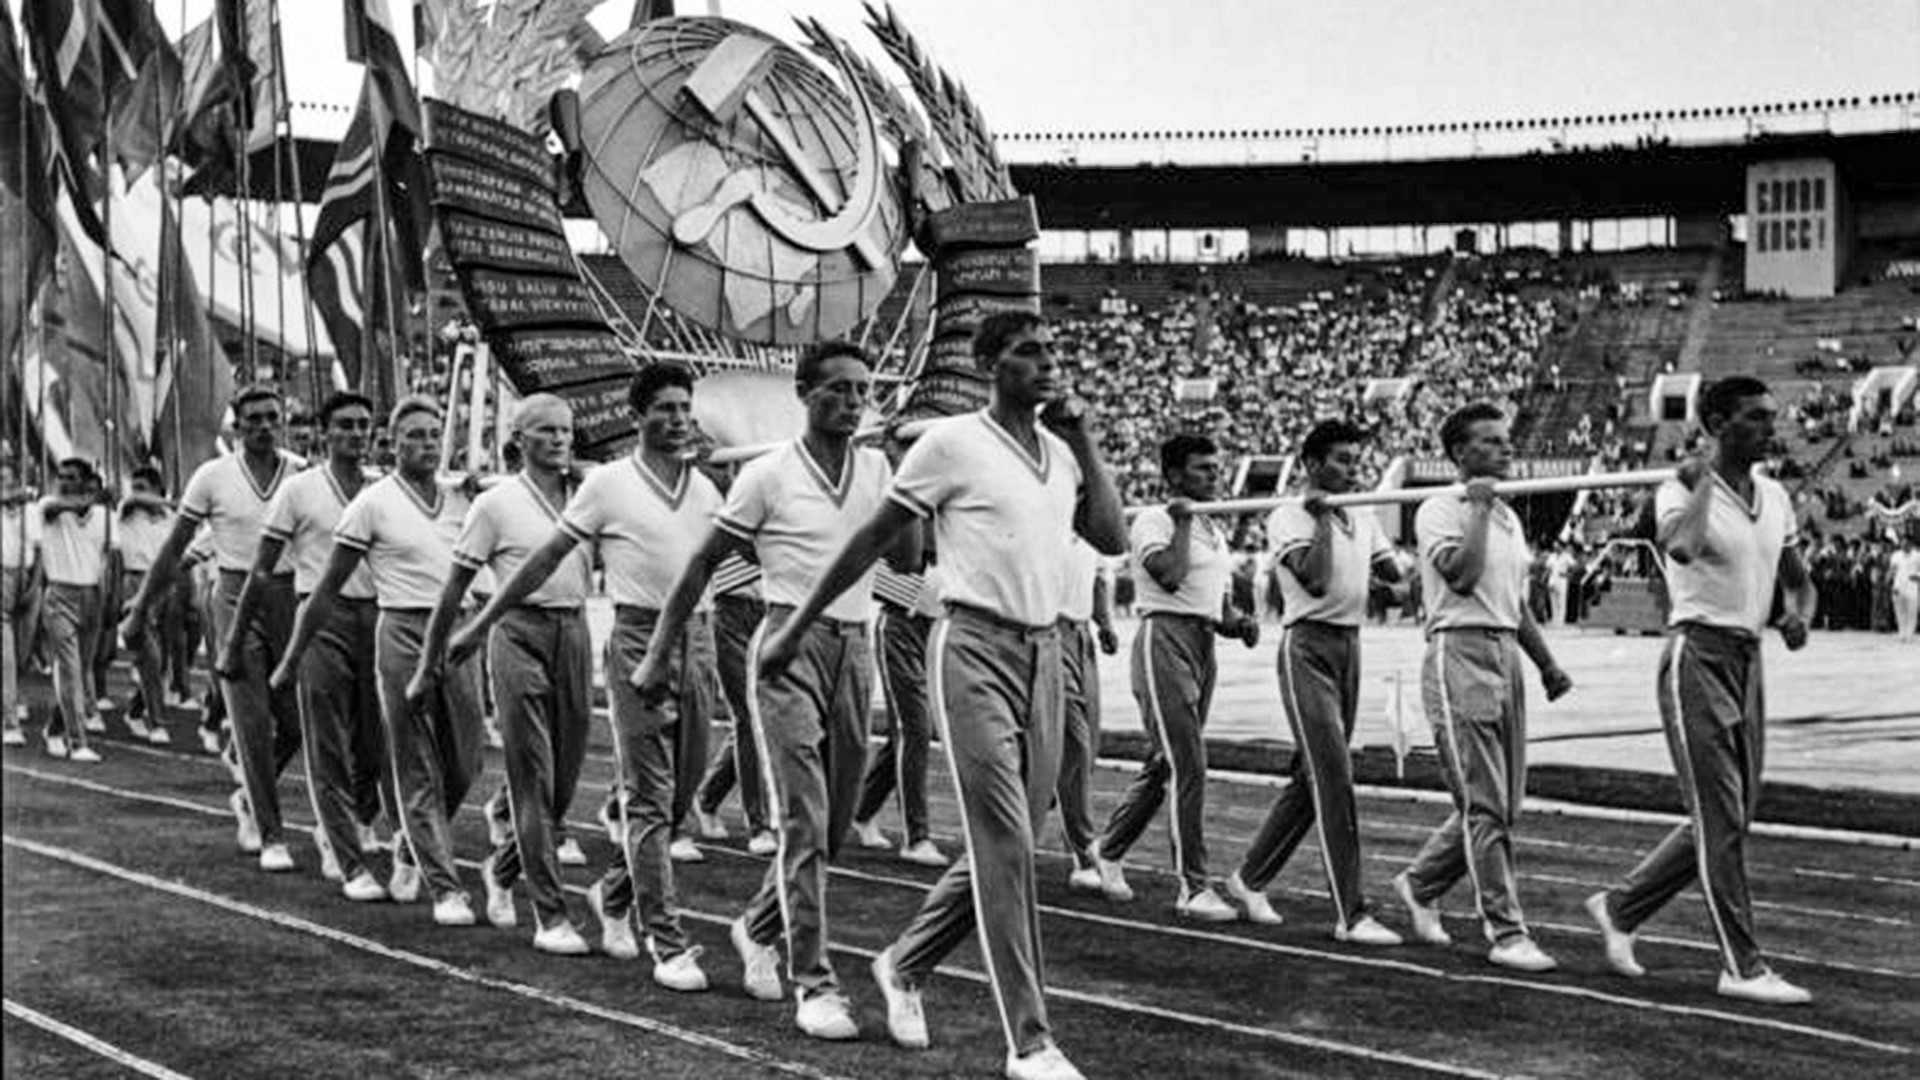 Soviet sportsmen, 1950s.